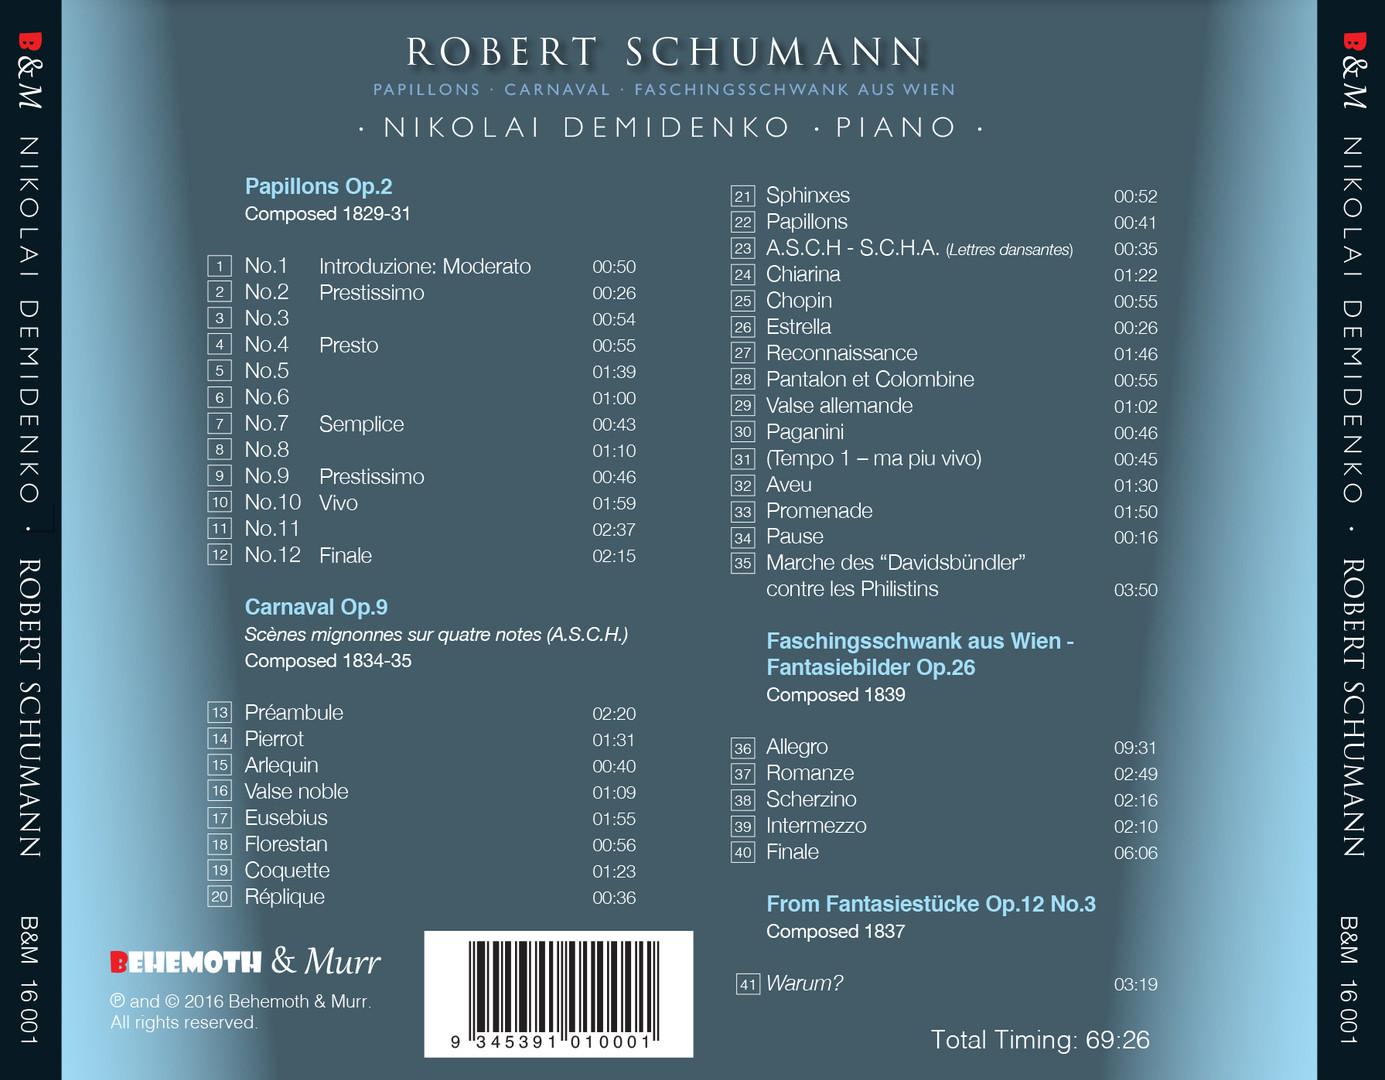 Nokolai Demidenko Robert Schumann CD Tray